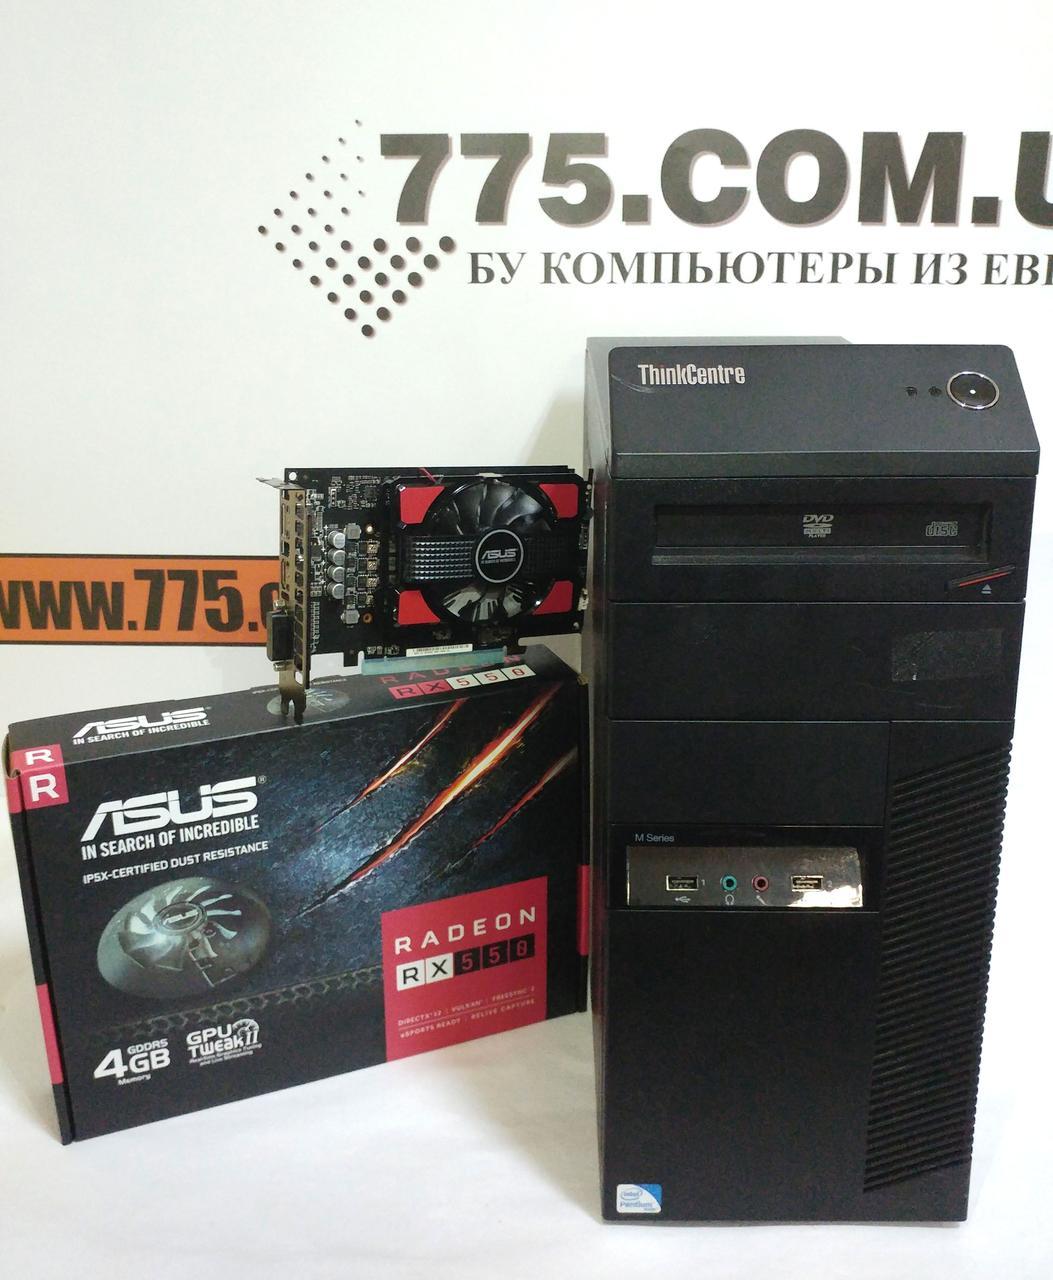 Lenovo M82 Tower Intel Core I3 2120 33ghz Ram 8 Hdd 250 Radeon Rx550 4gb